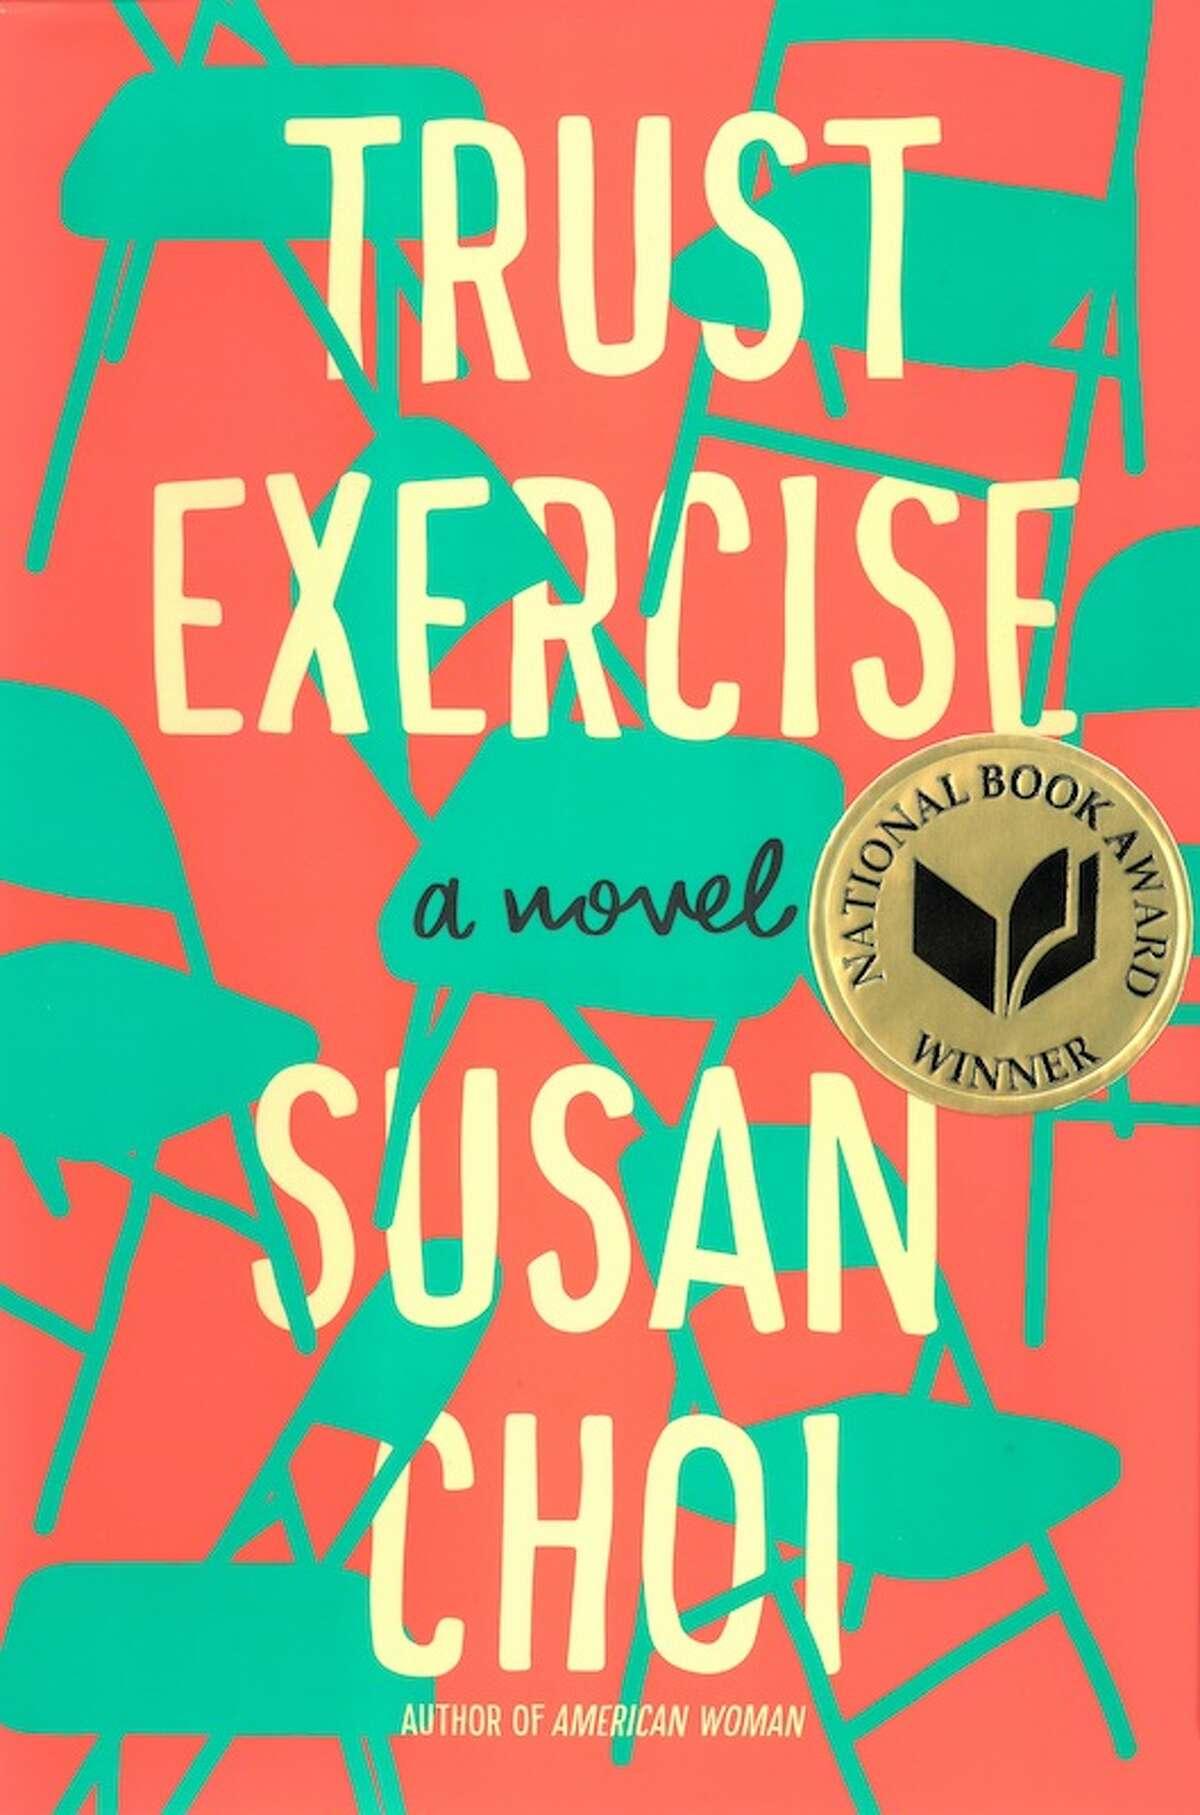 Author Susan Choi won the National Book Award for